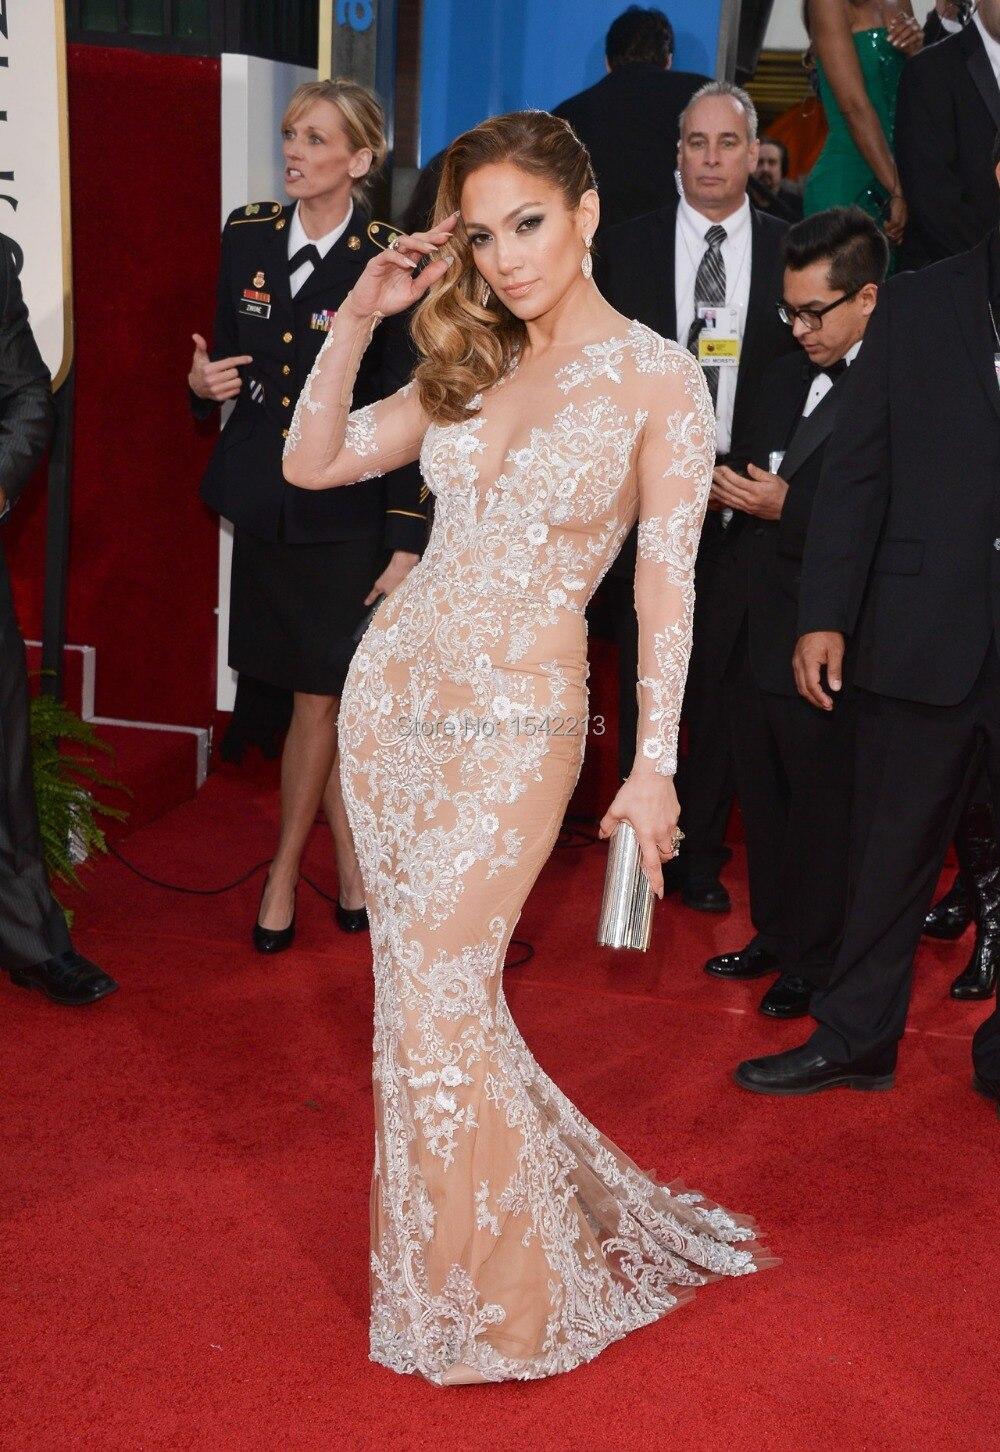 Celebrities at Prom - Kim Kardashian, Taylor Swift, George Best celebrity prom photos